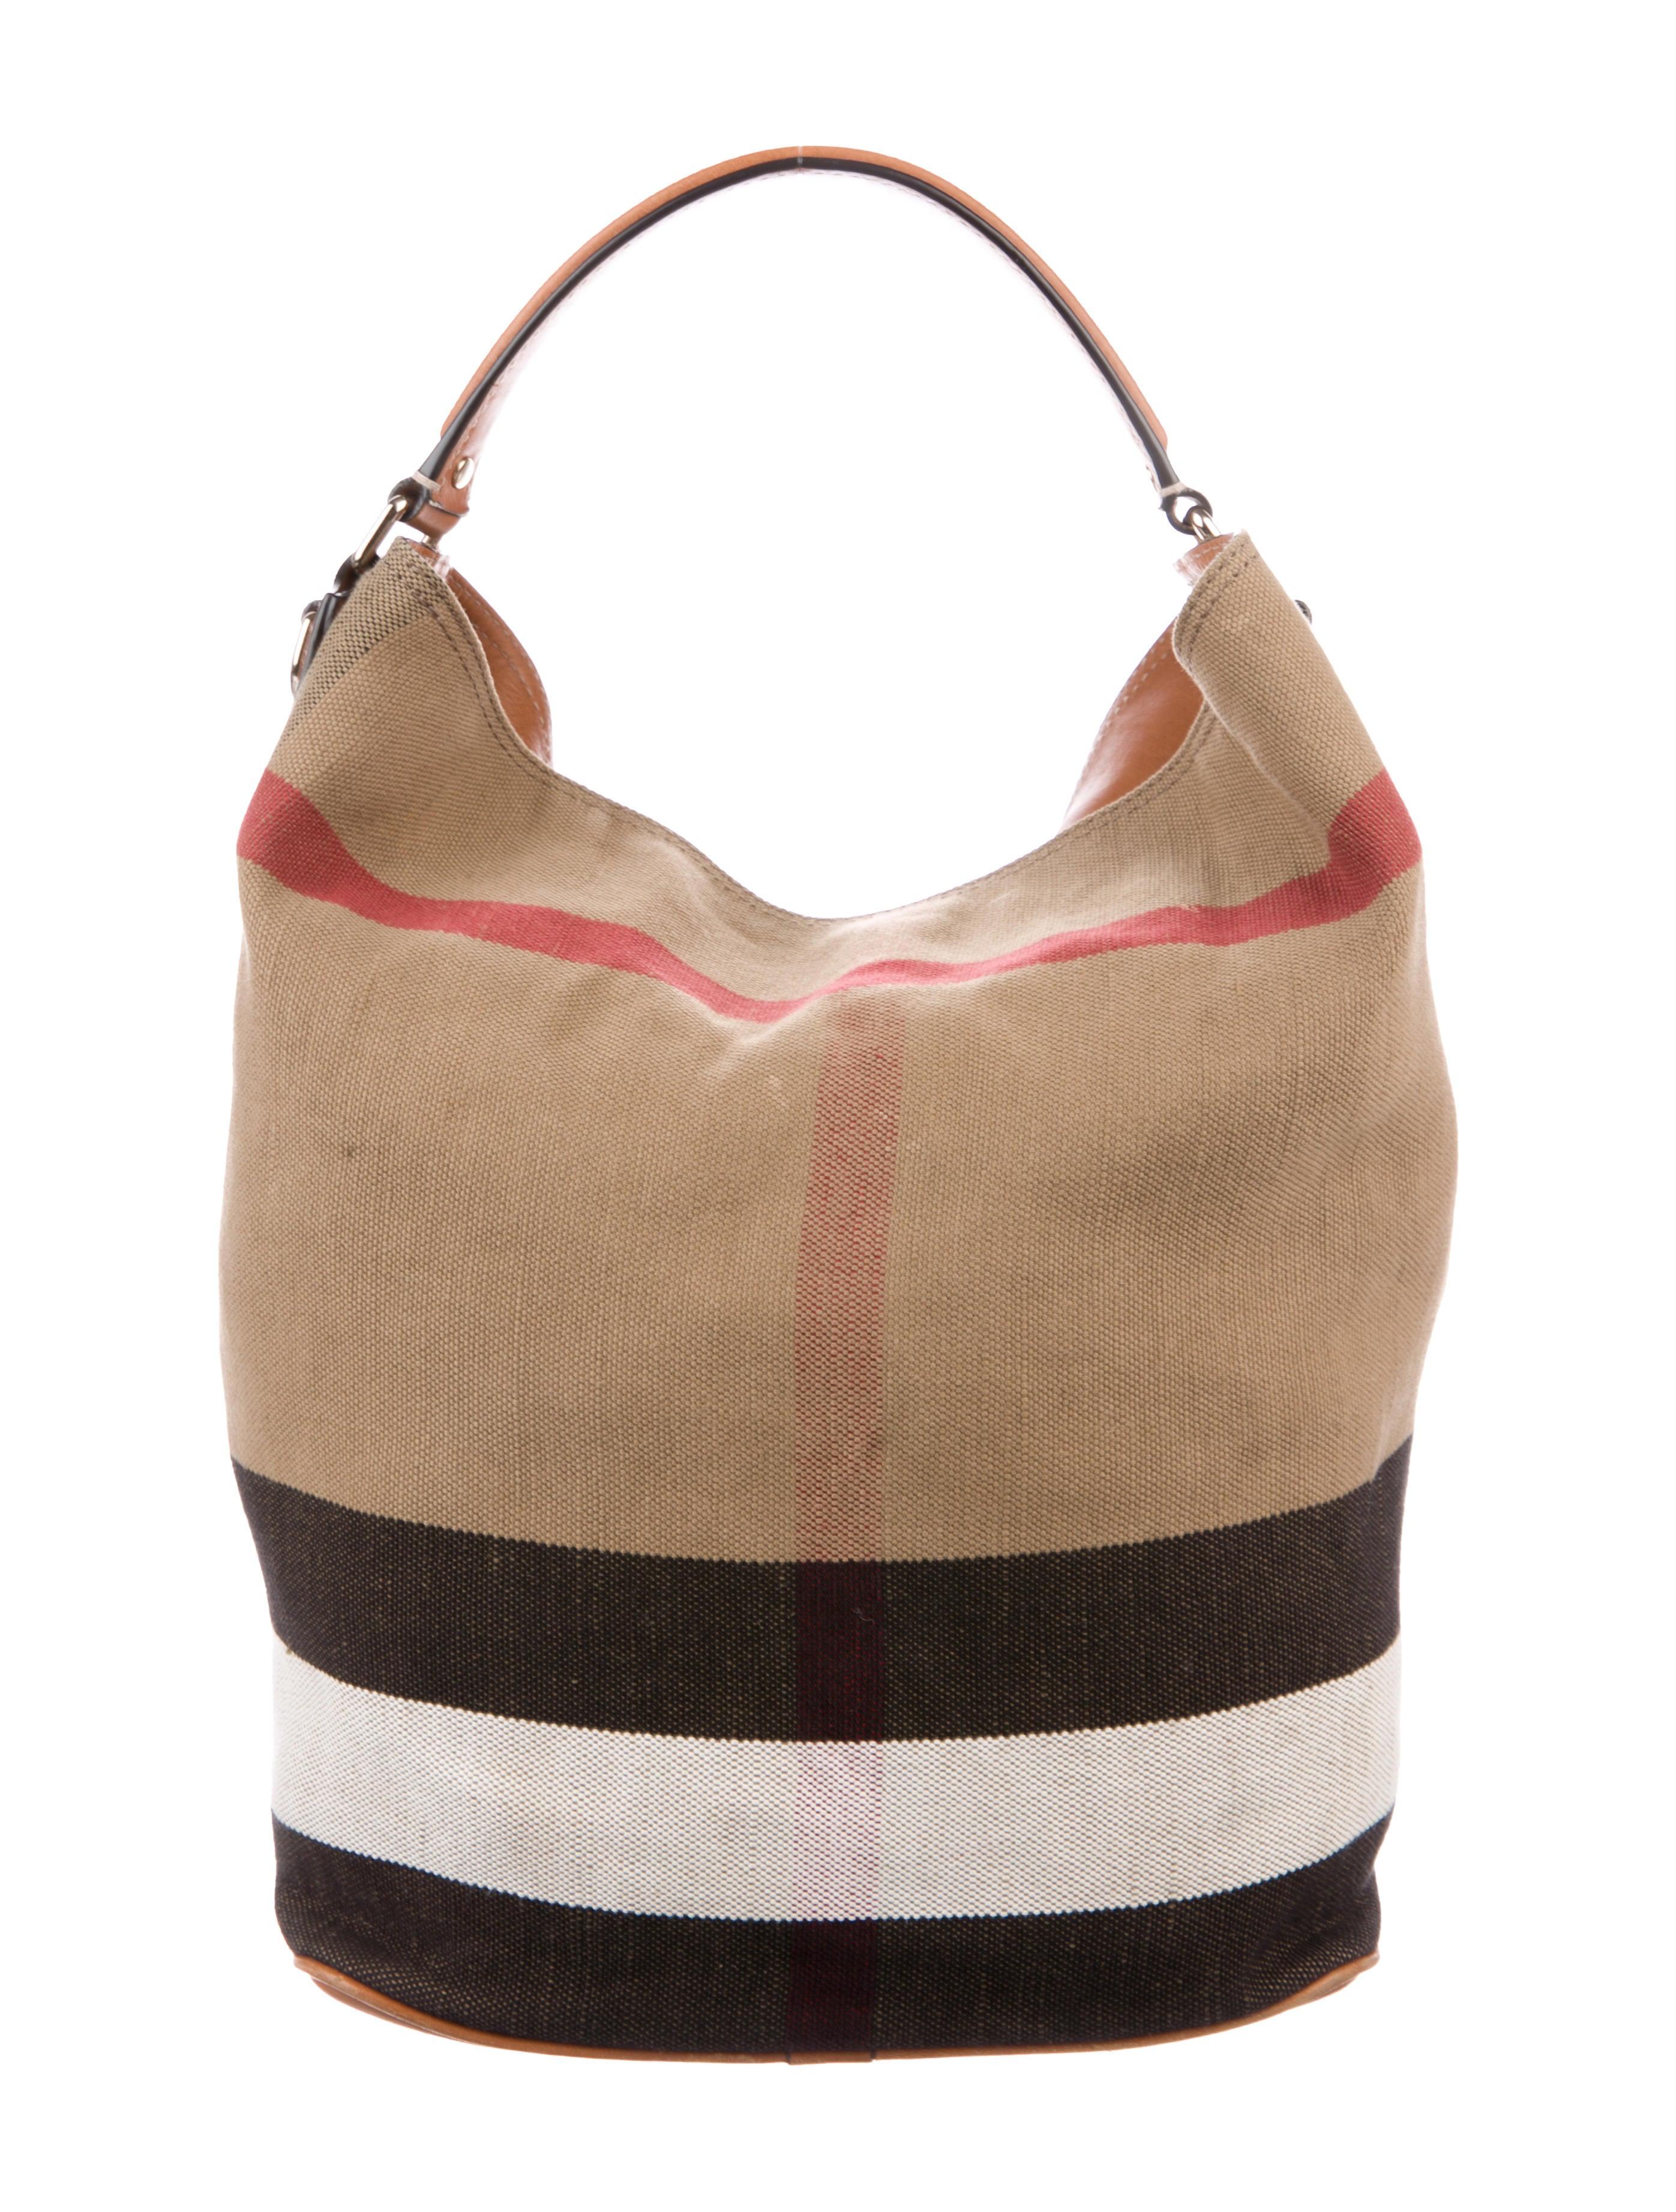 35d0561b9e3c Burberry Medium Ashby Bucket Bag - Handbags - BUR118441